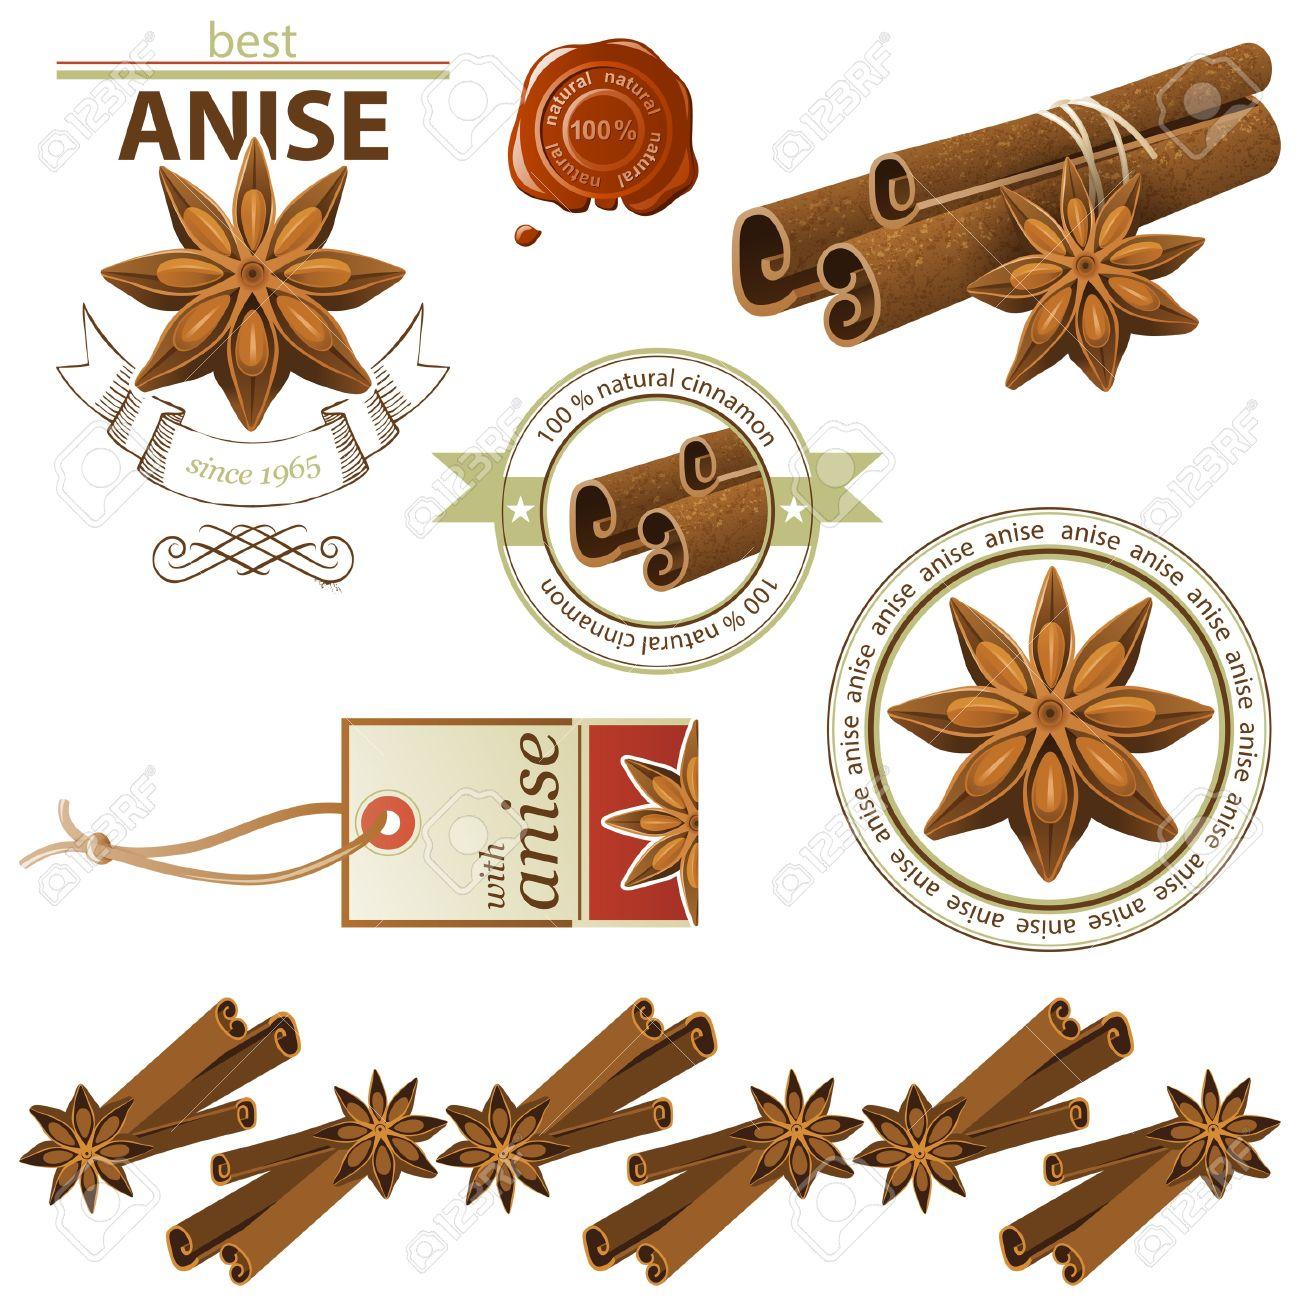 Anise stars and cinnamon sticks set Stock Vector - 20422905